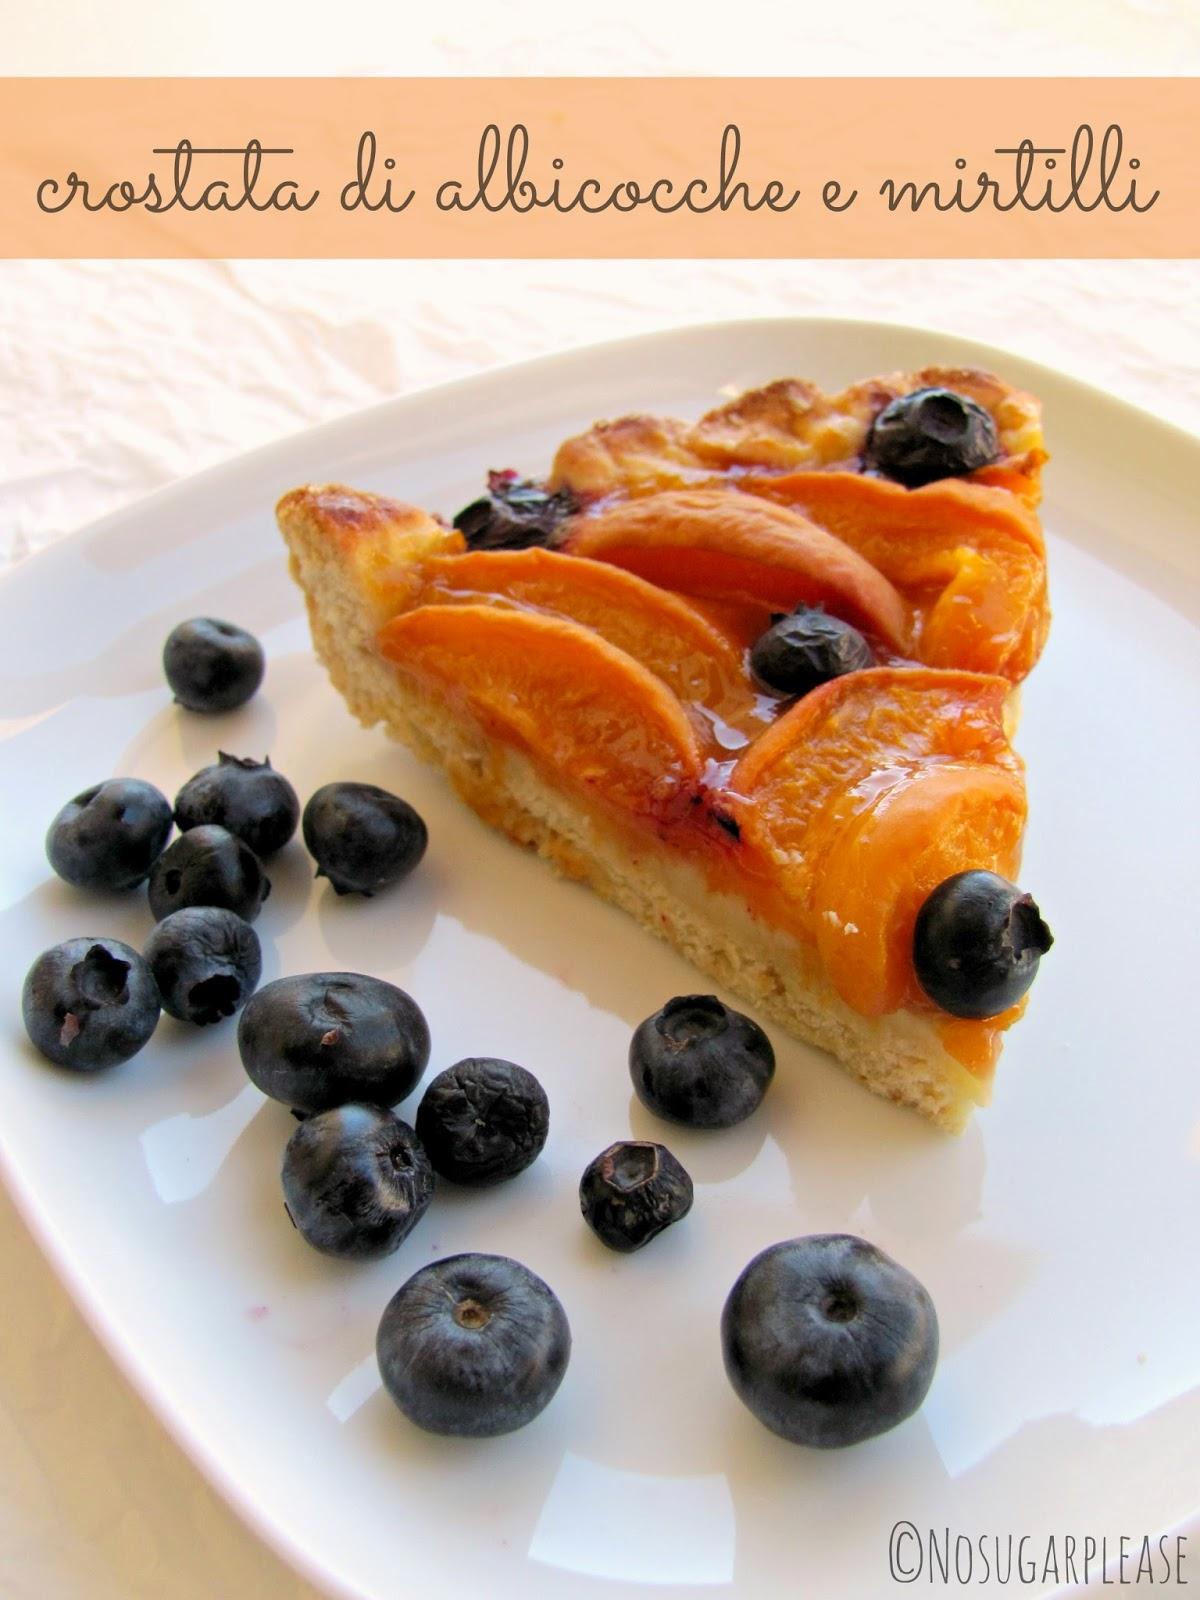 crostata albicocche e mirtilli senza zucchero vegan